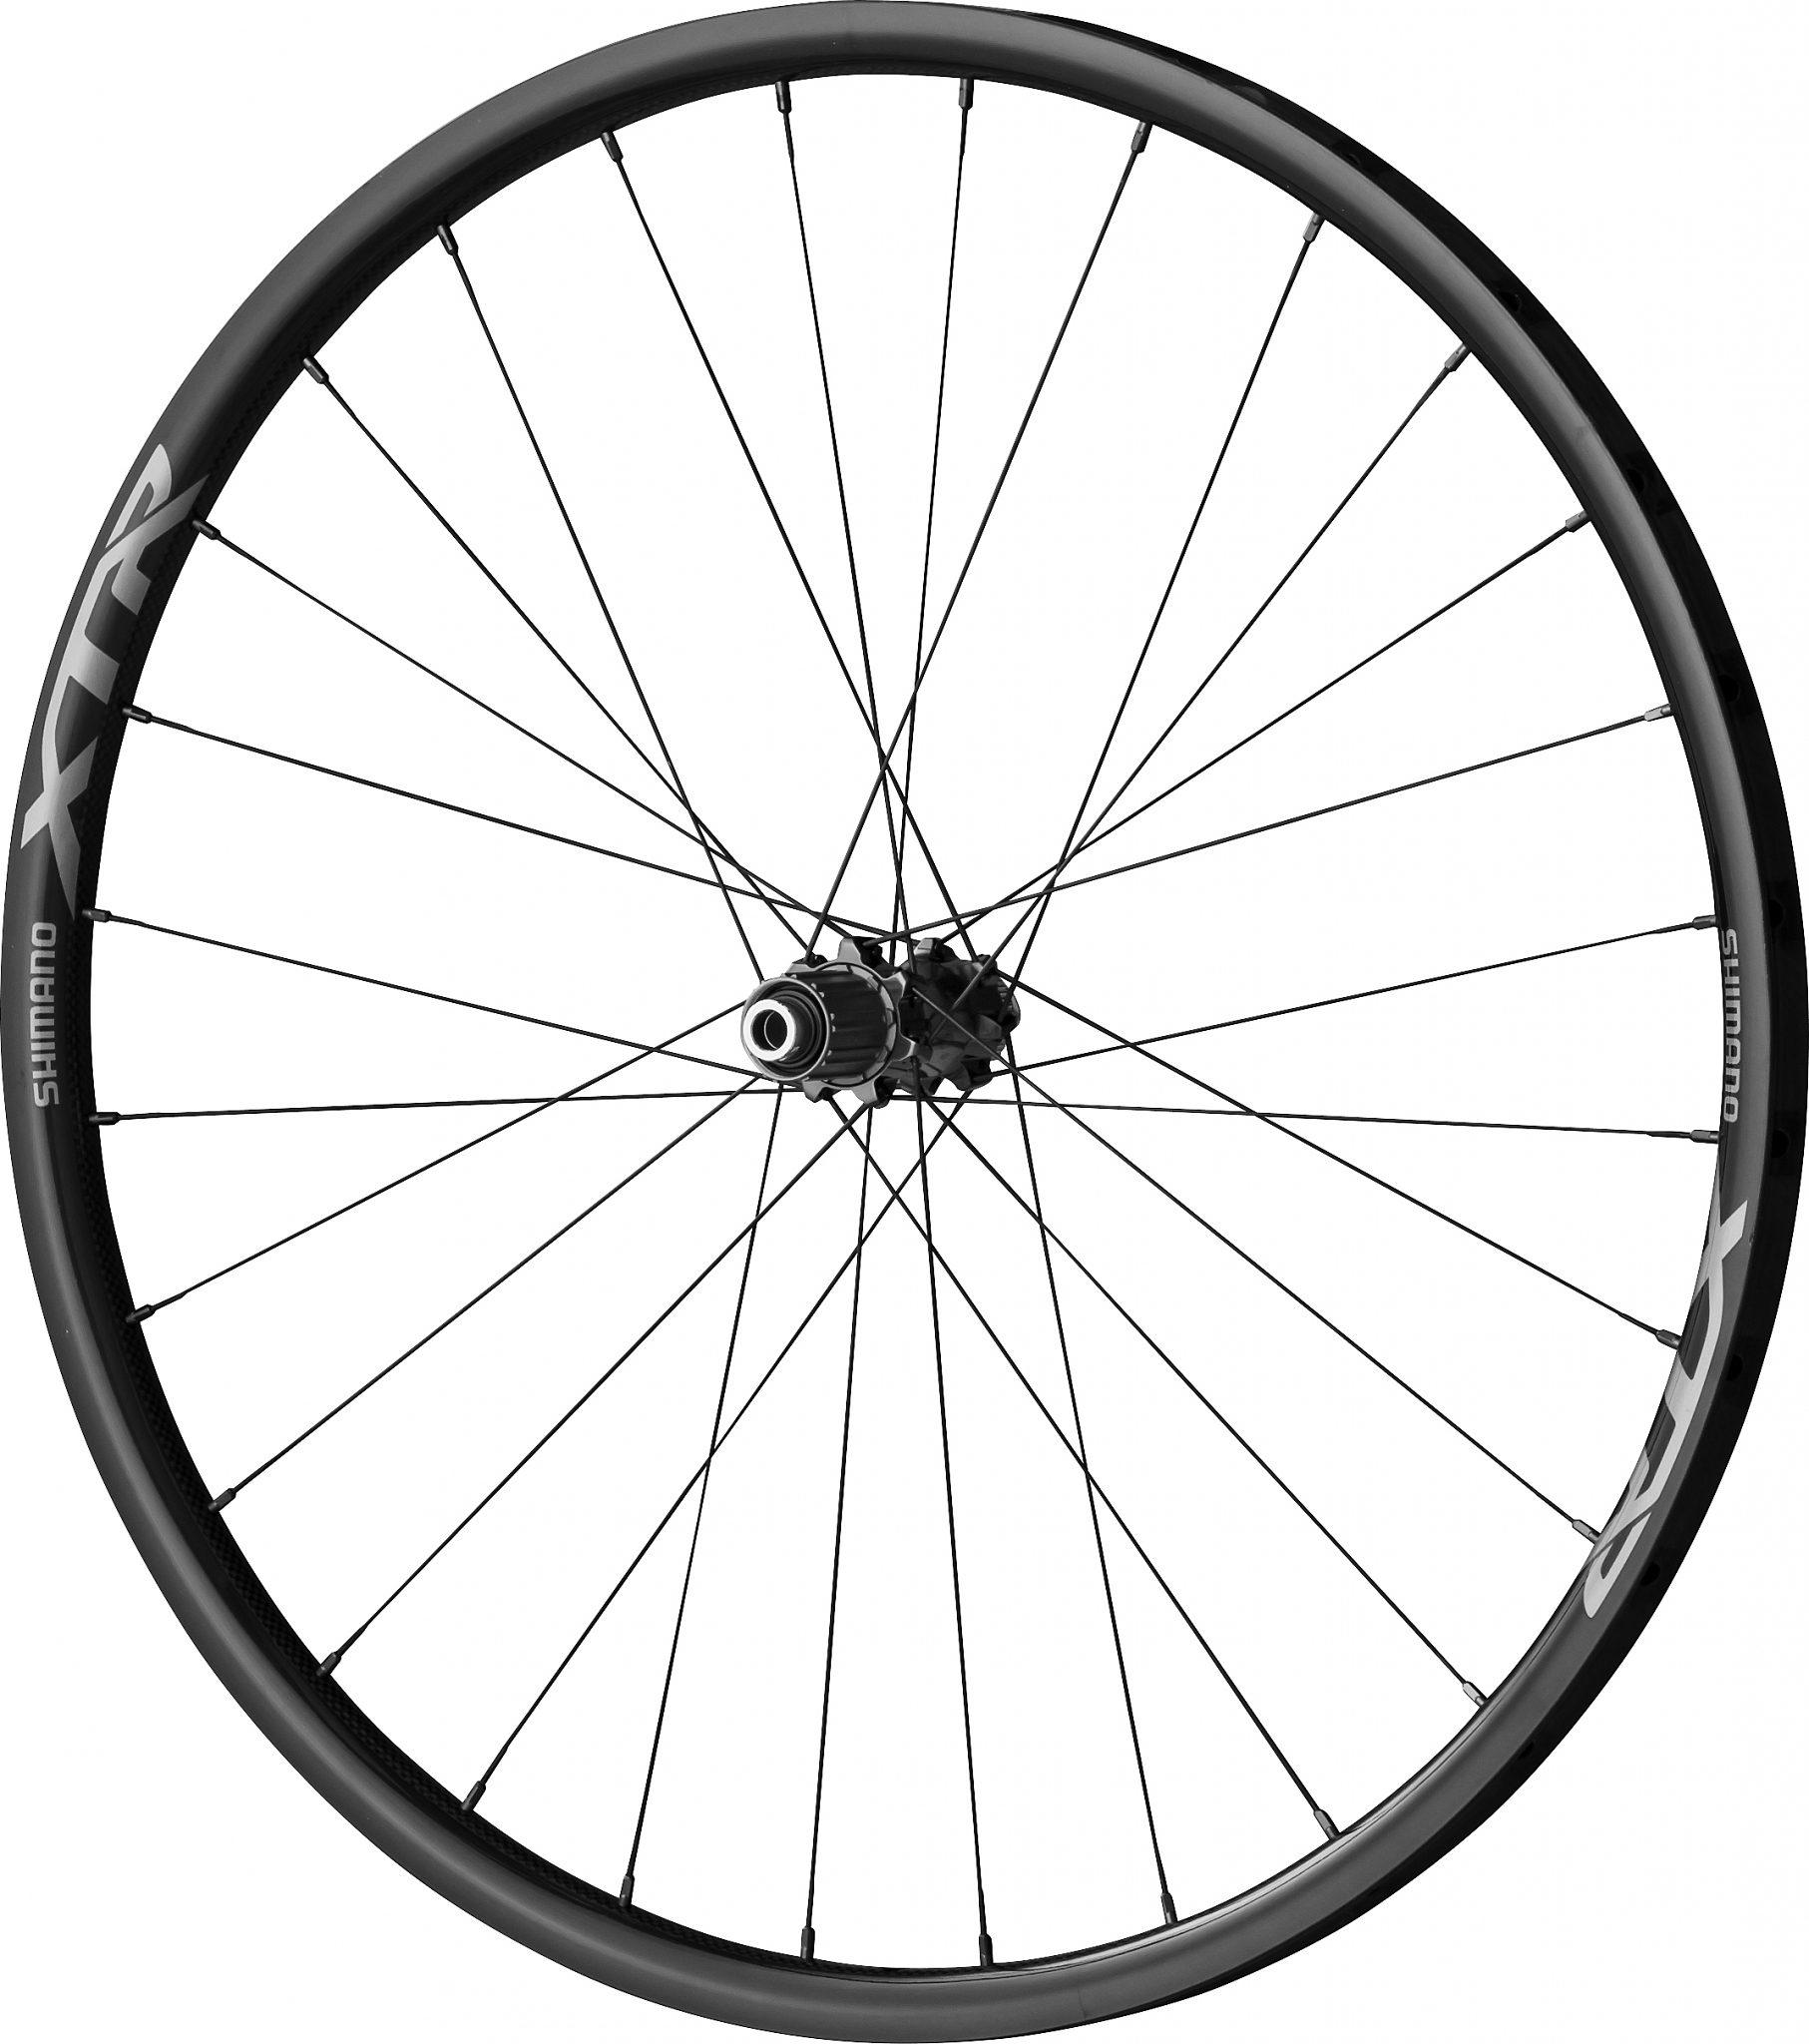 "Shimano Laufrad »XTR WH-M9000 Laufradsatz Carbon 29"" CL schwarz«"